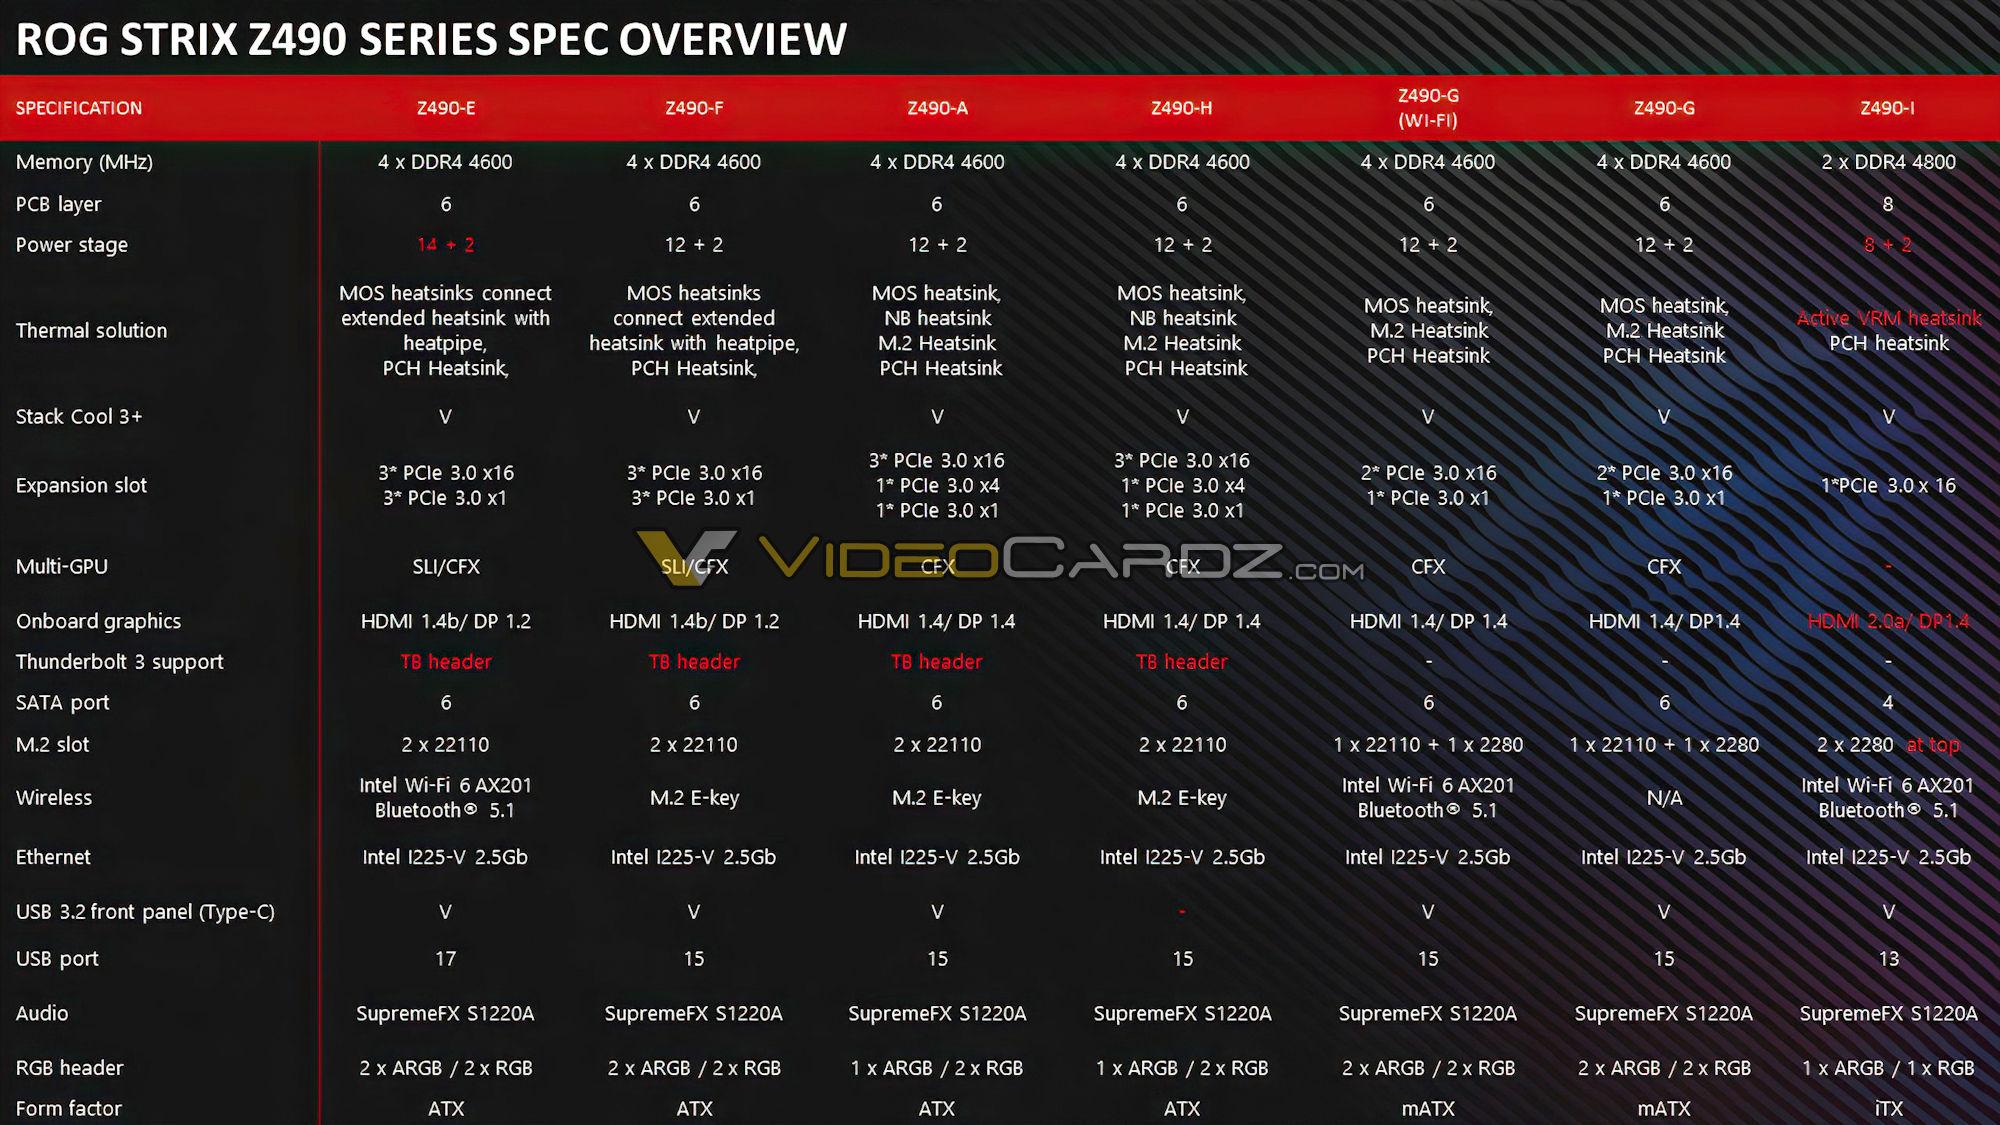 https://cdn.videocardz.com/1/2020/04/ASUS-Z490-ROG-STRIX-Specs.jpg